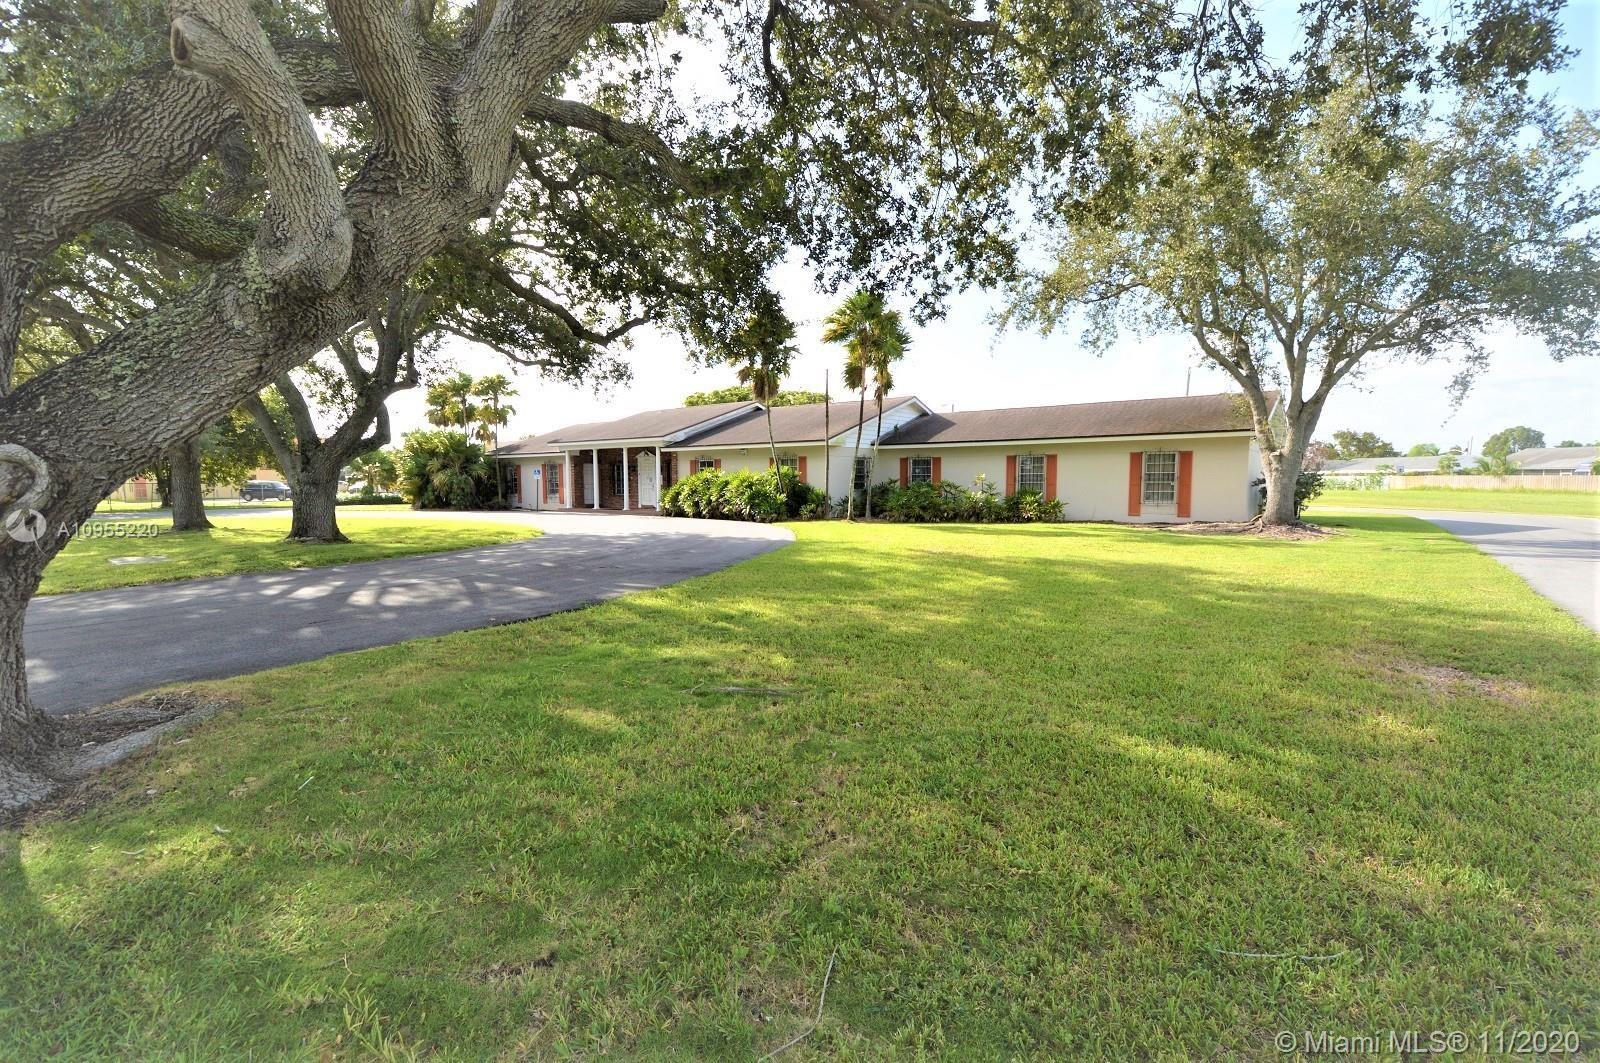 30010 S Dixie Hwy, Homestead, FL 33033